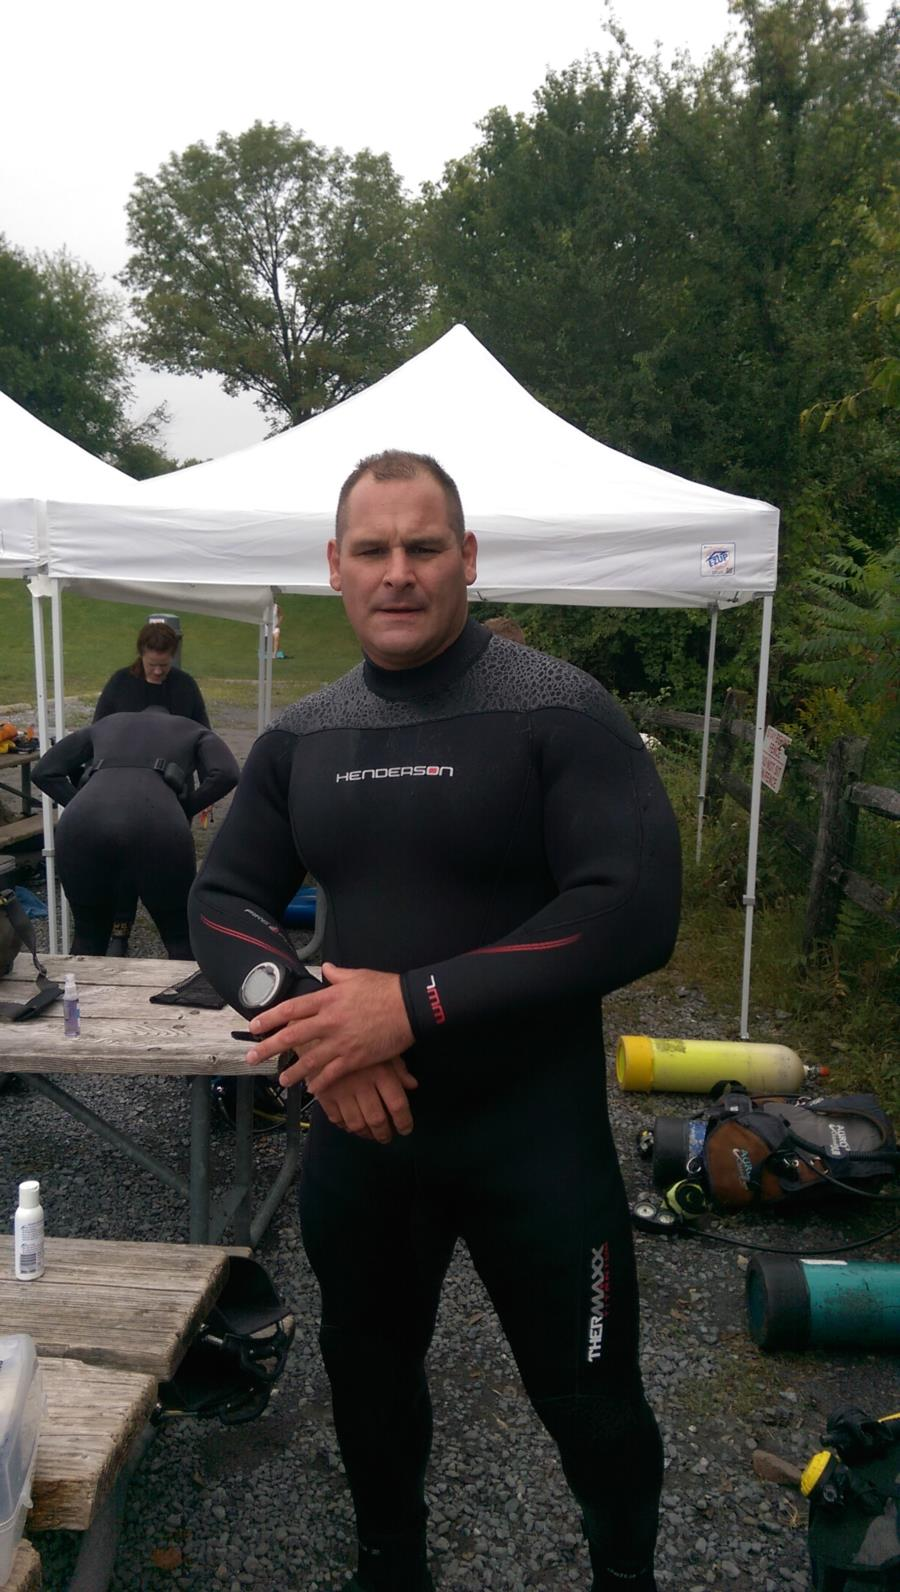 New wetsuit